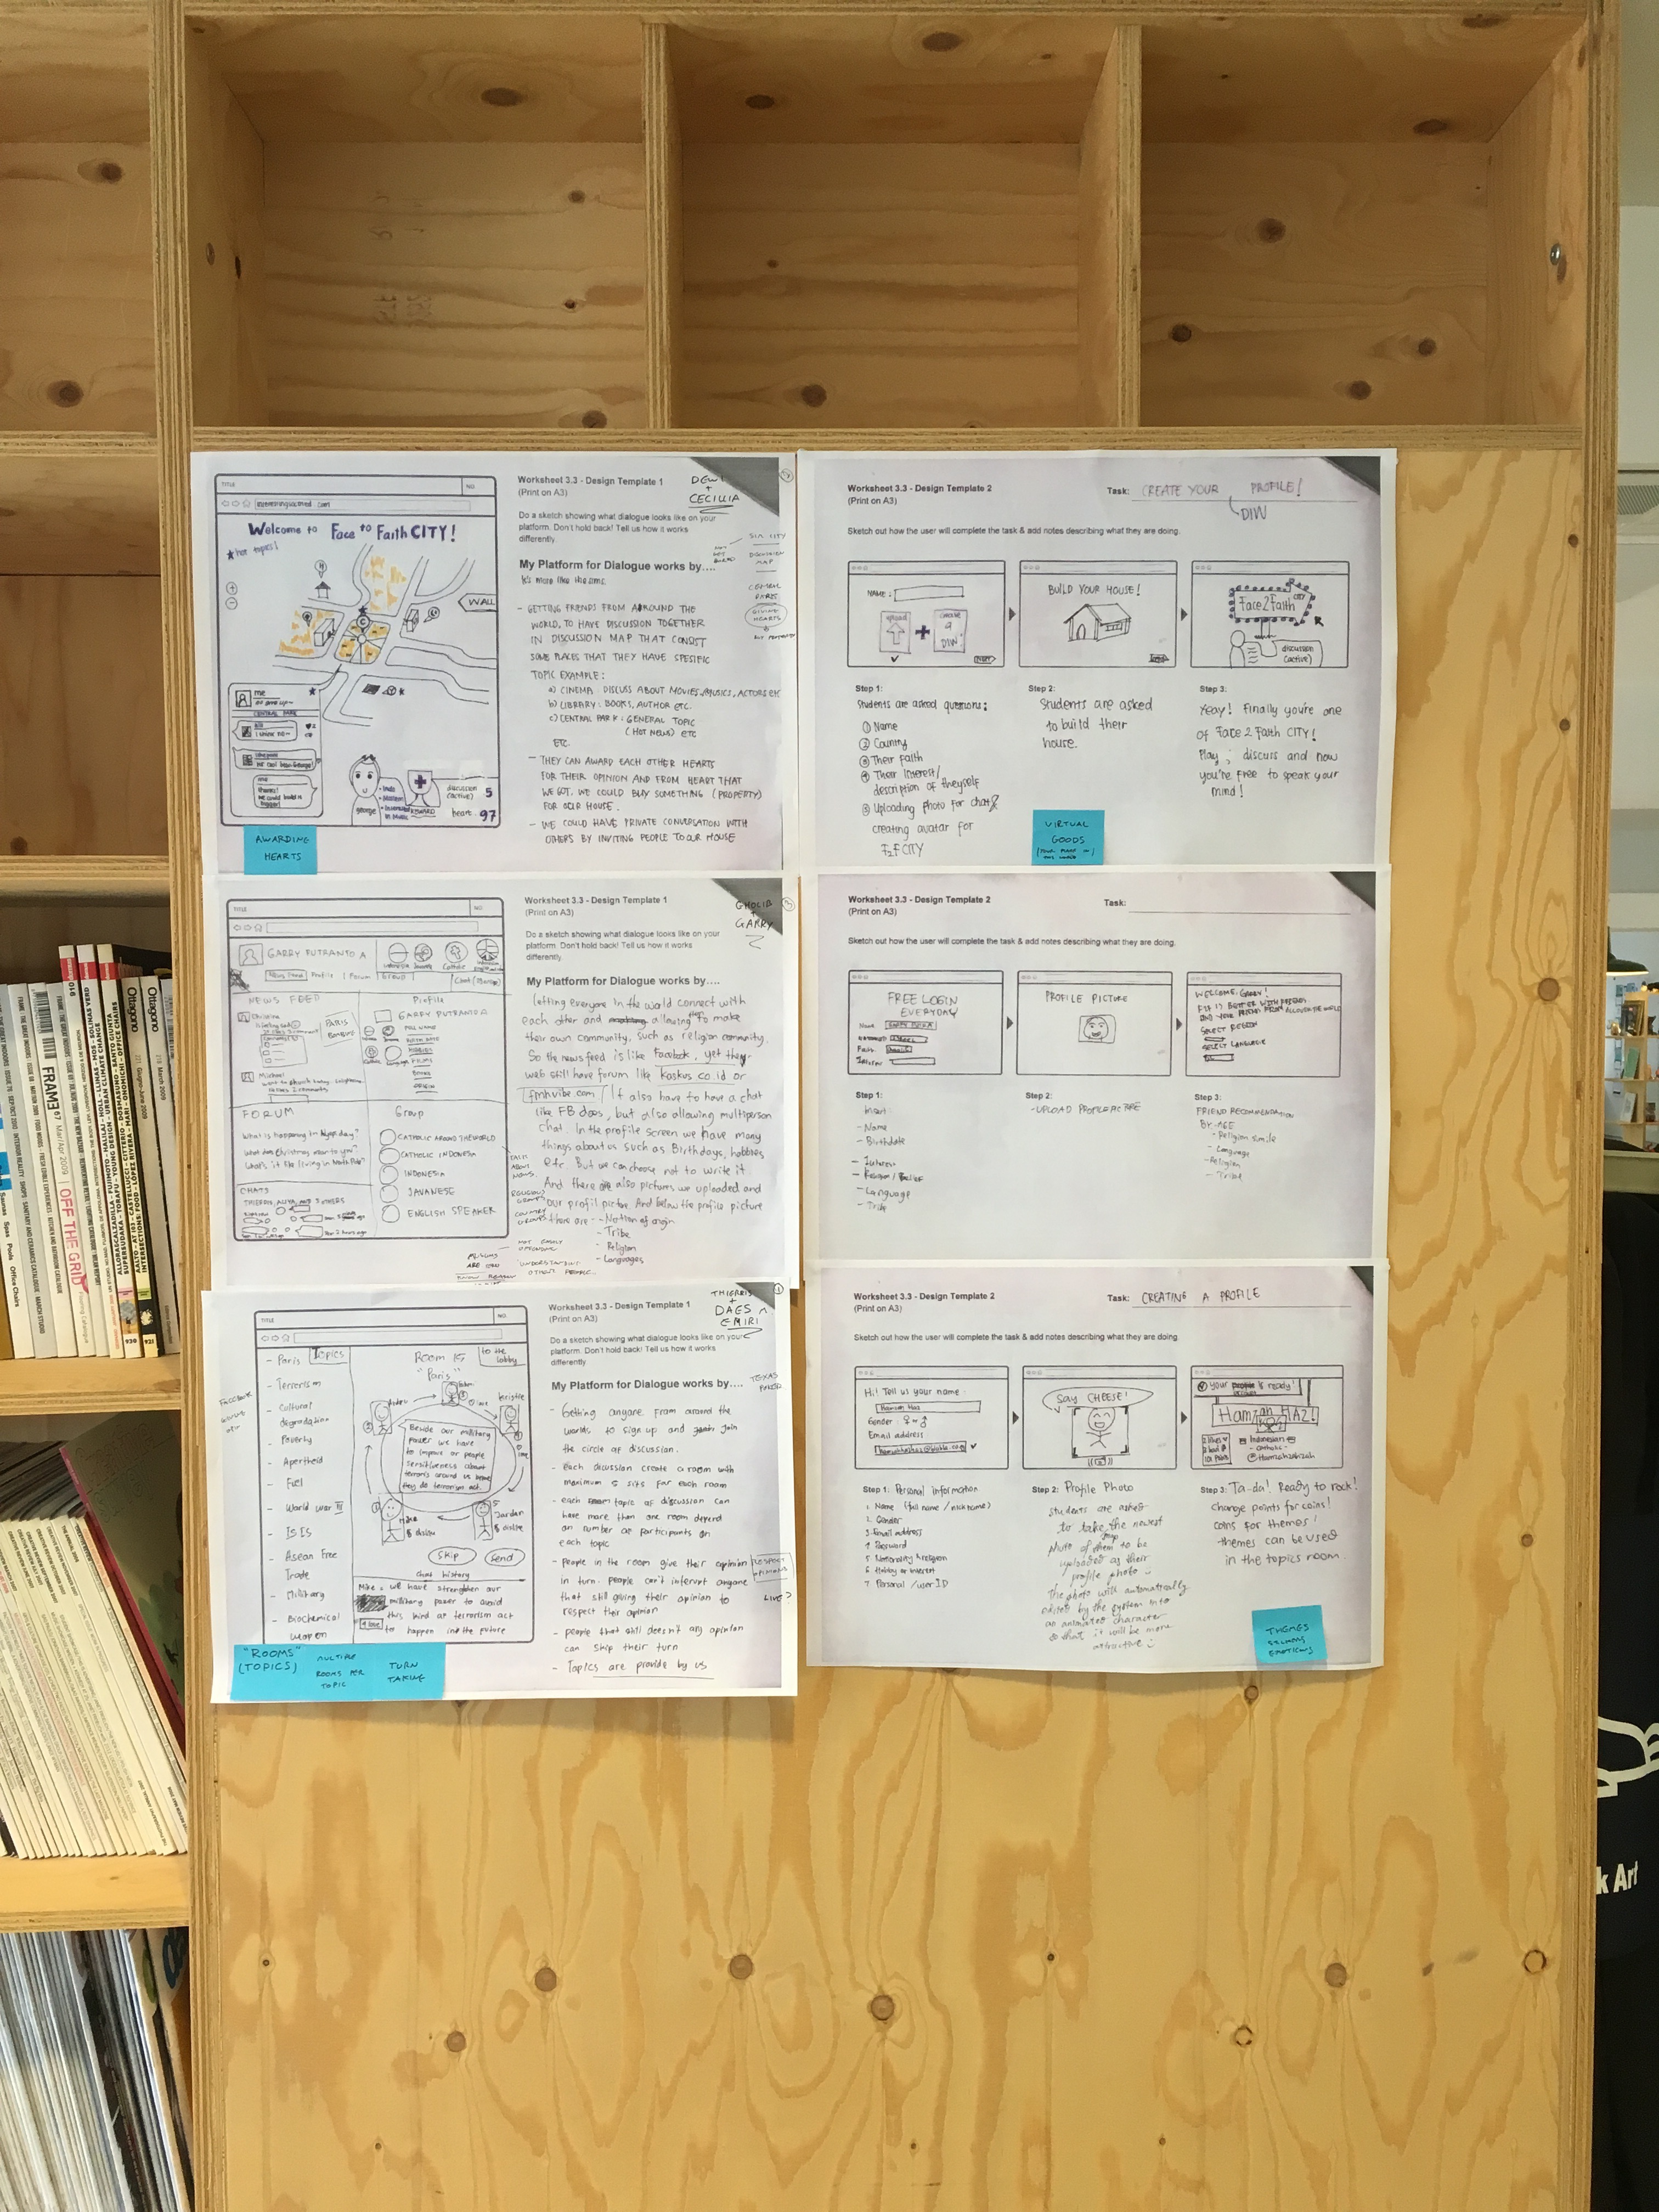 The co-design process